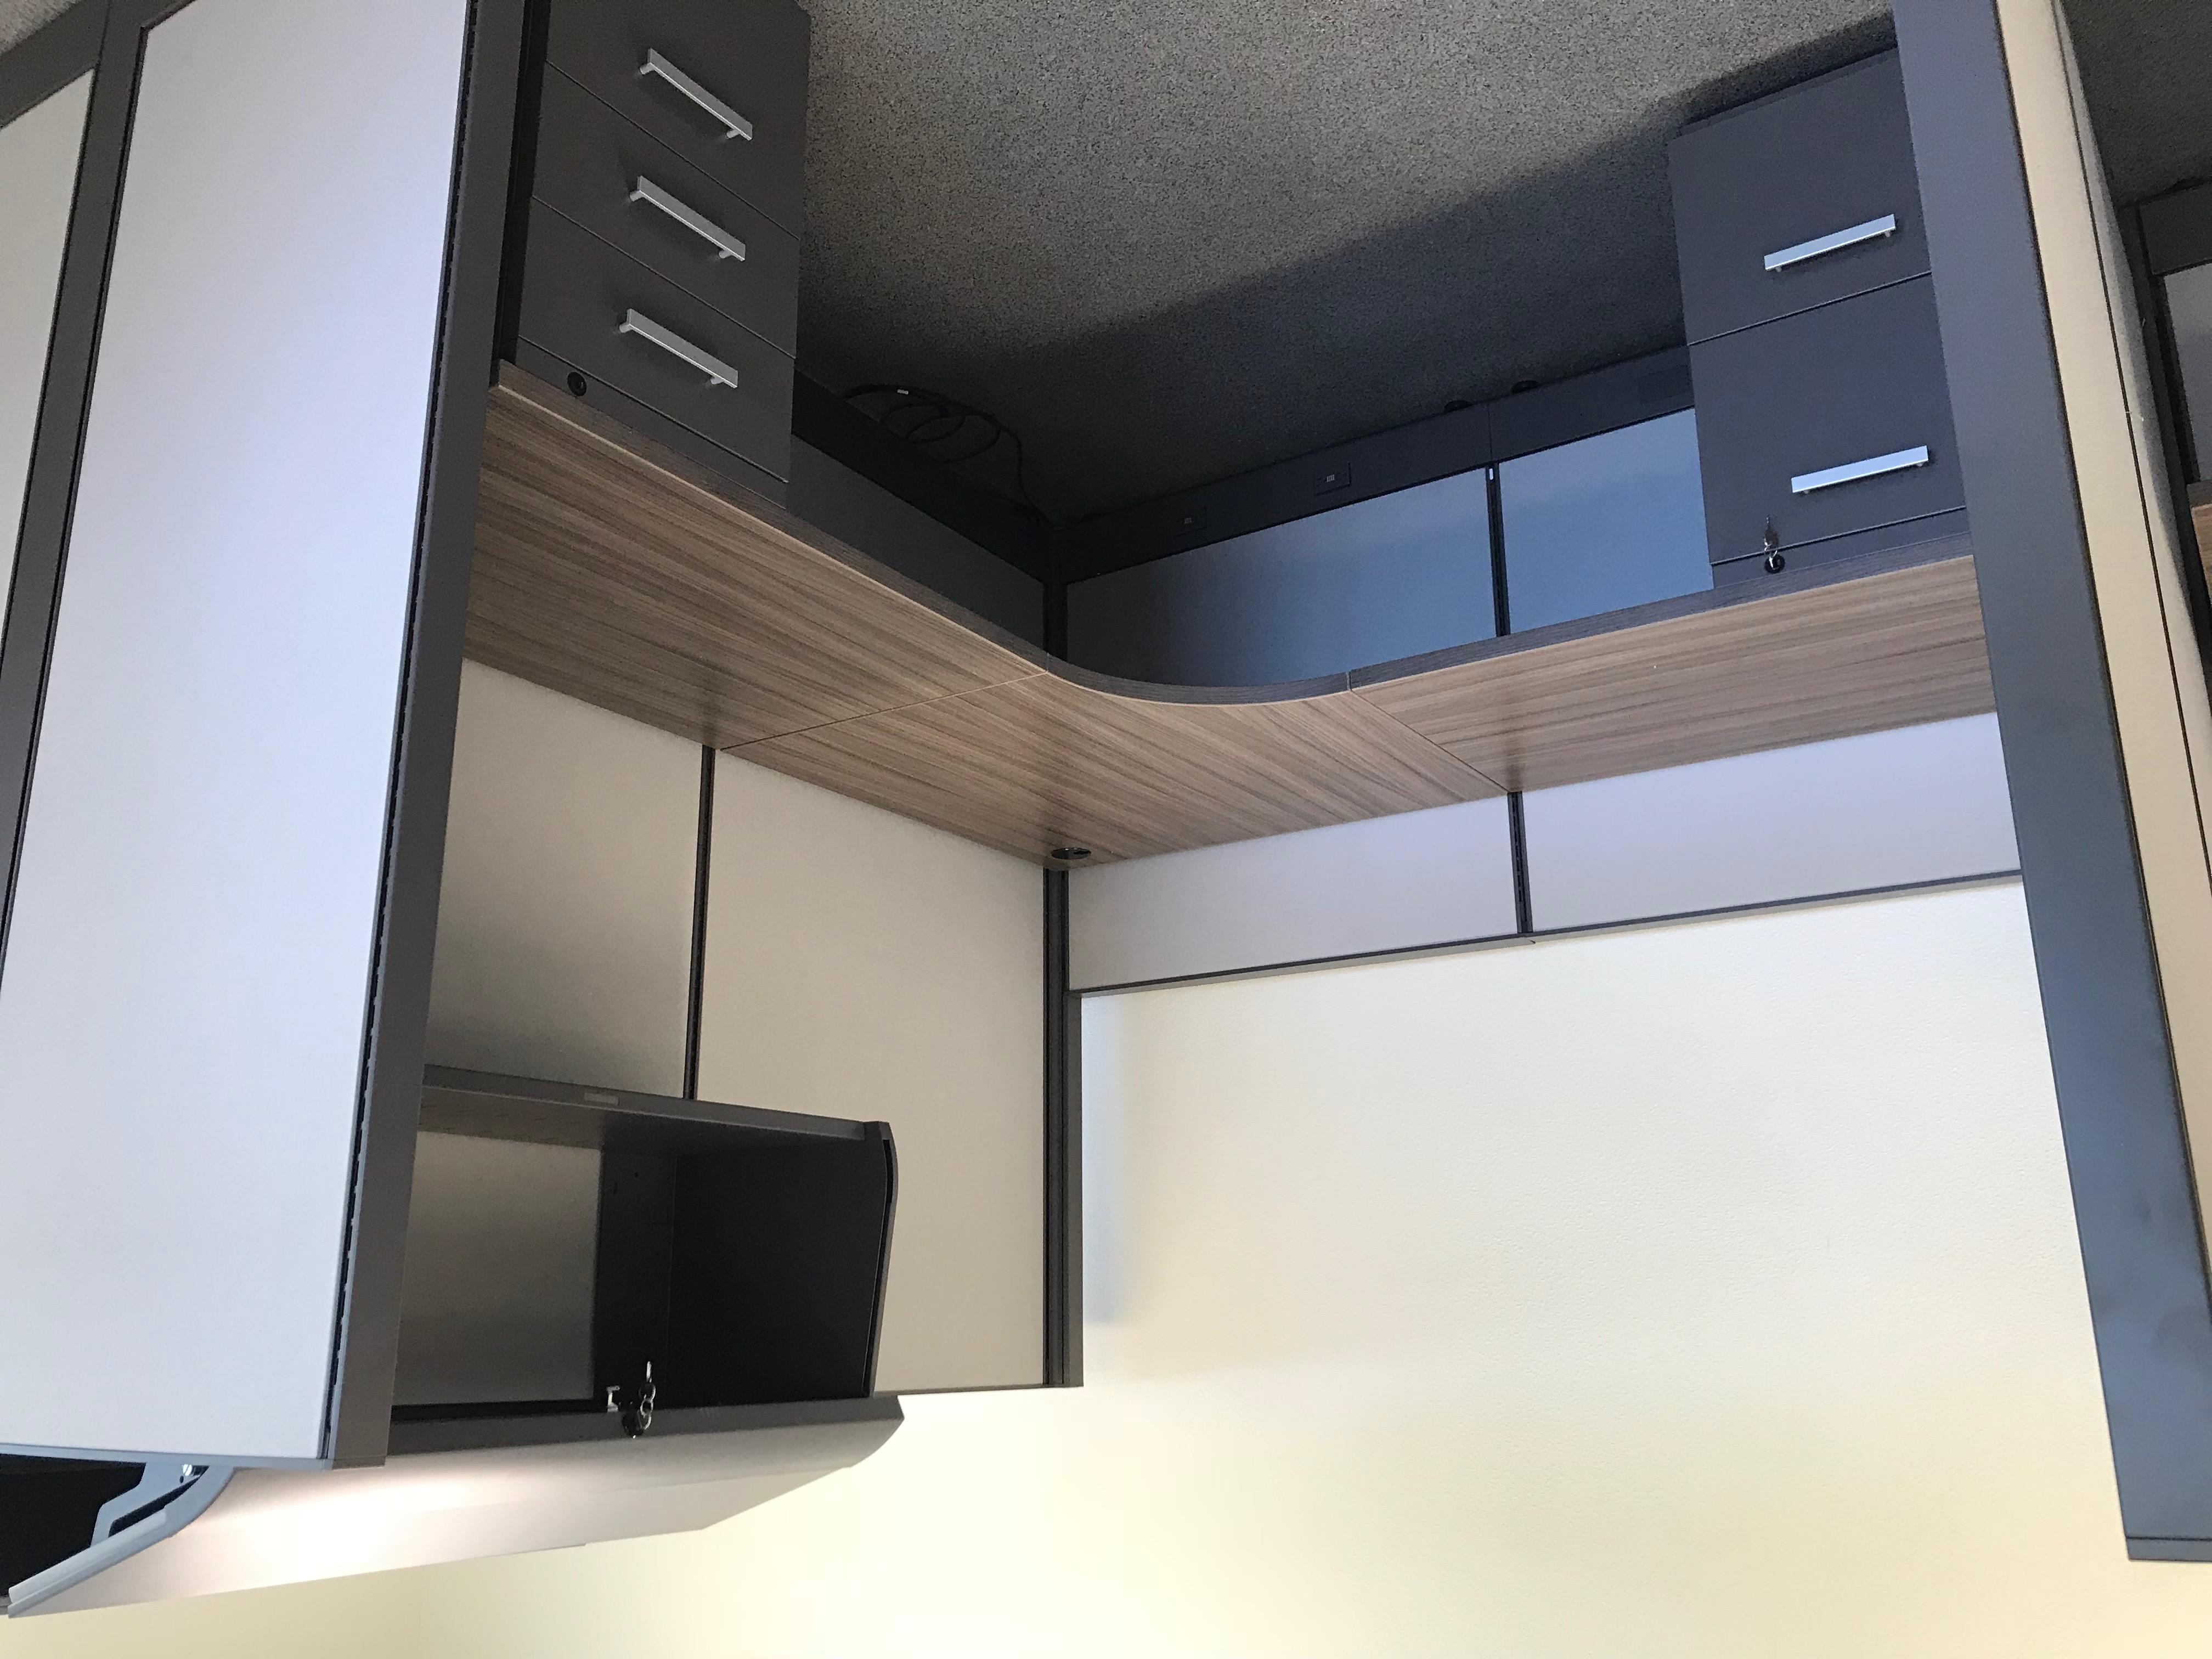 office-furniture-north-port-florida-manasota-office-supplies-llc.jpg